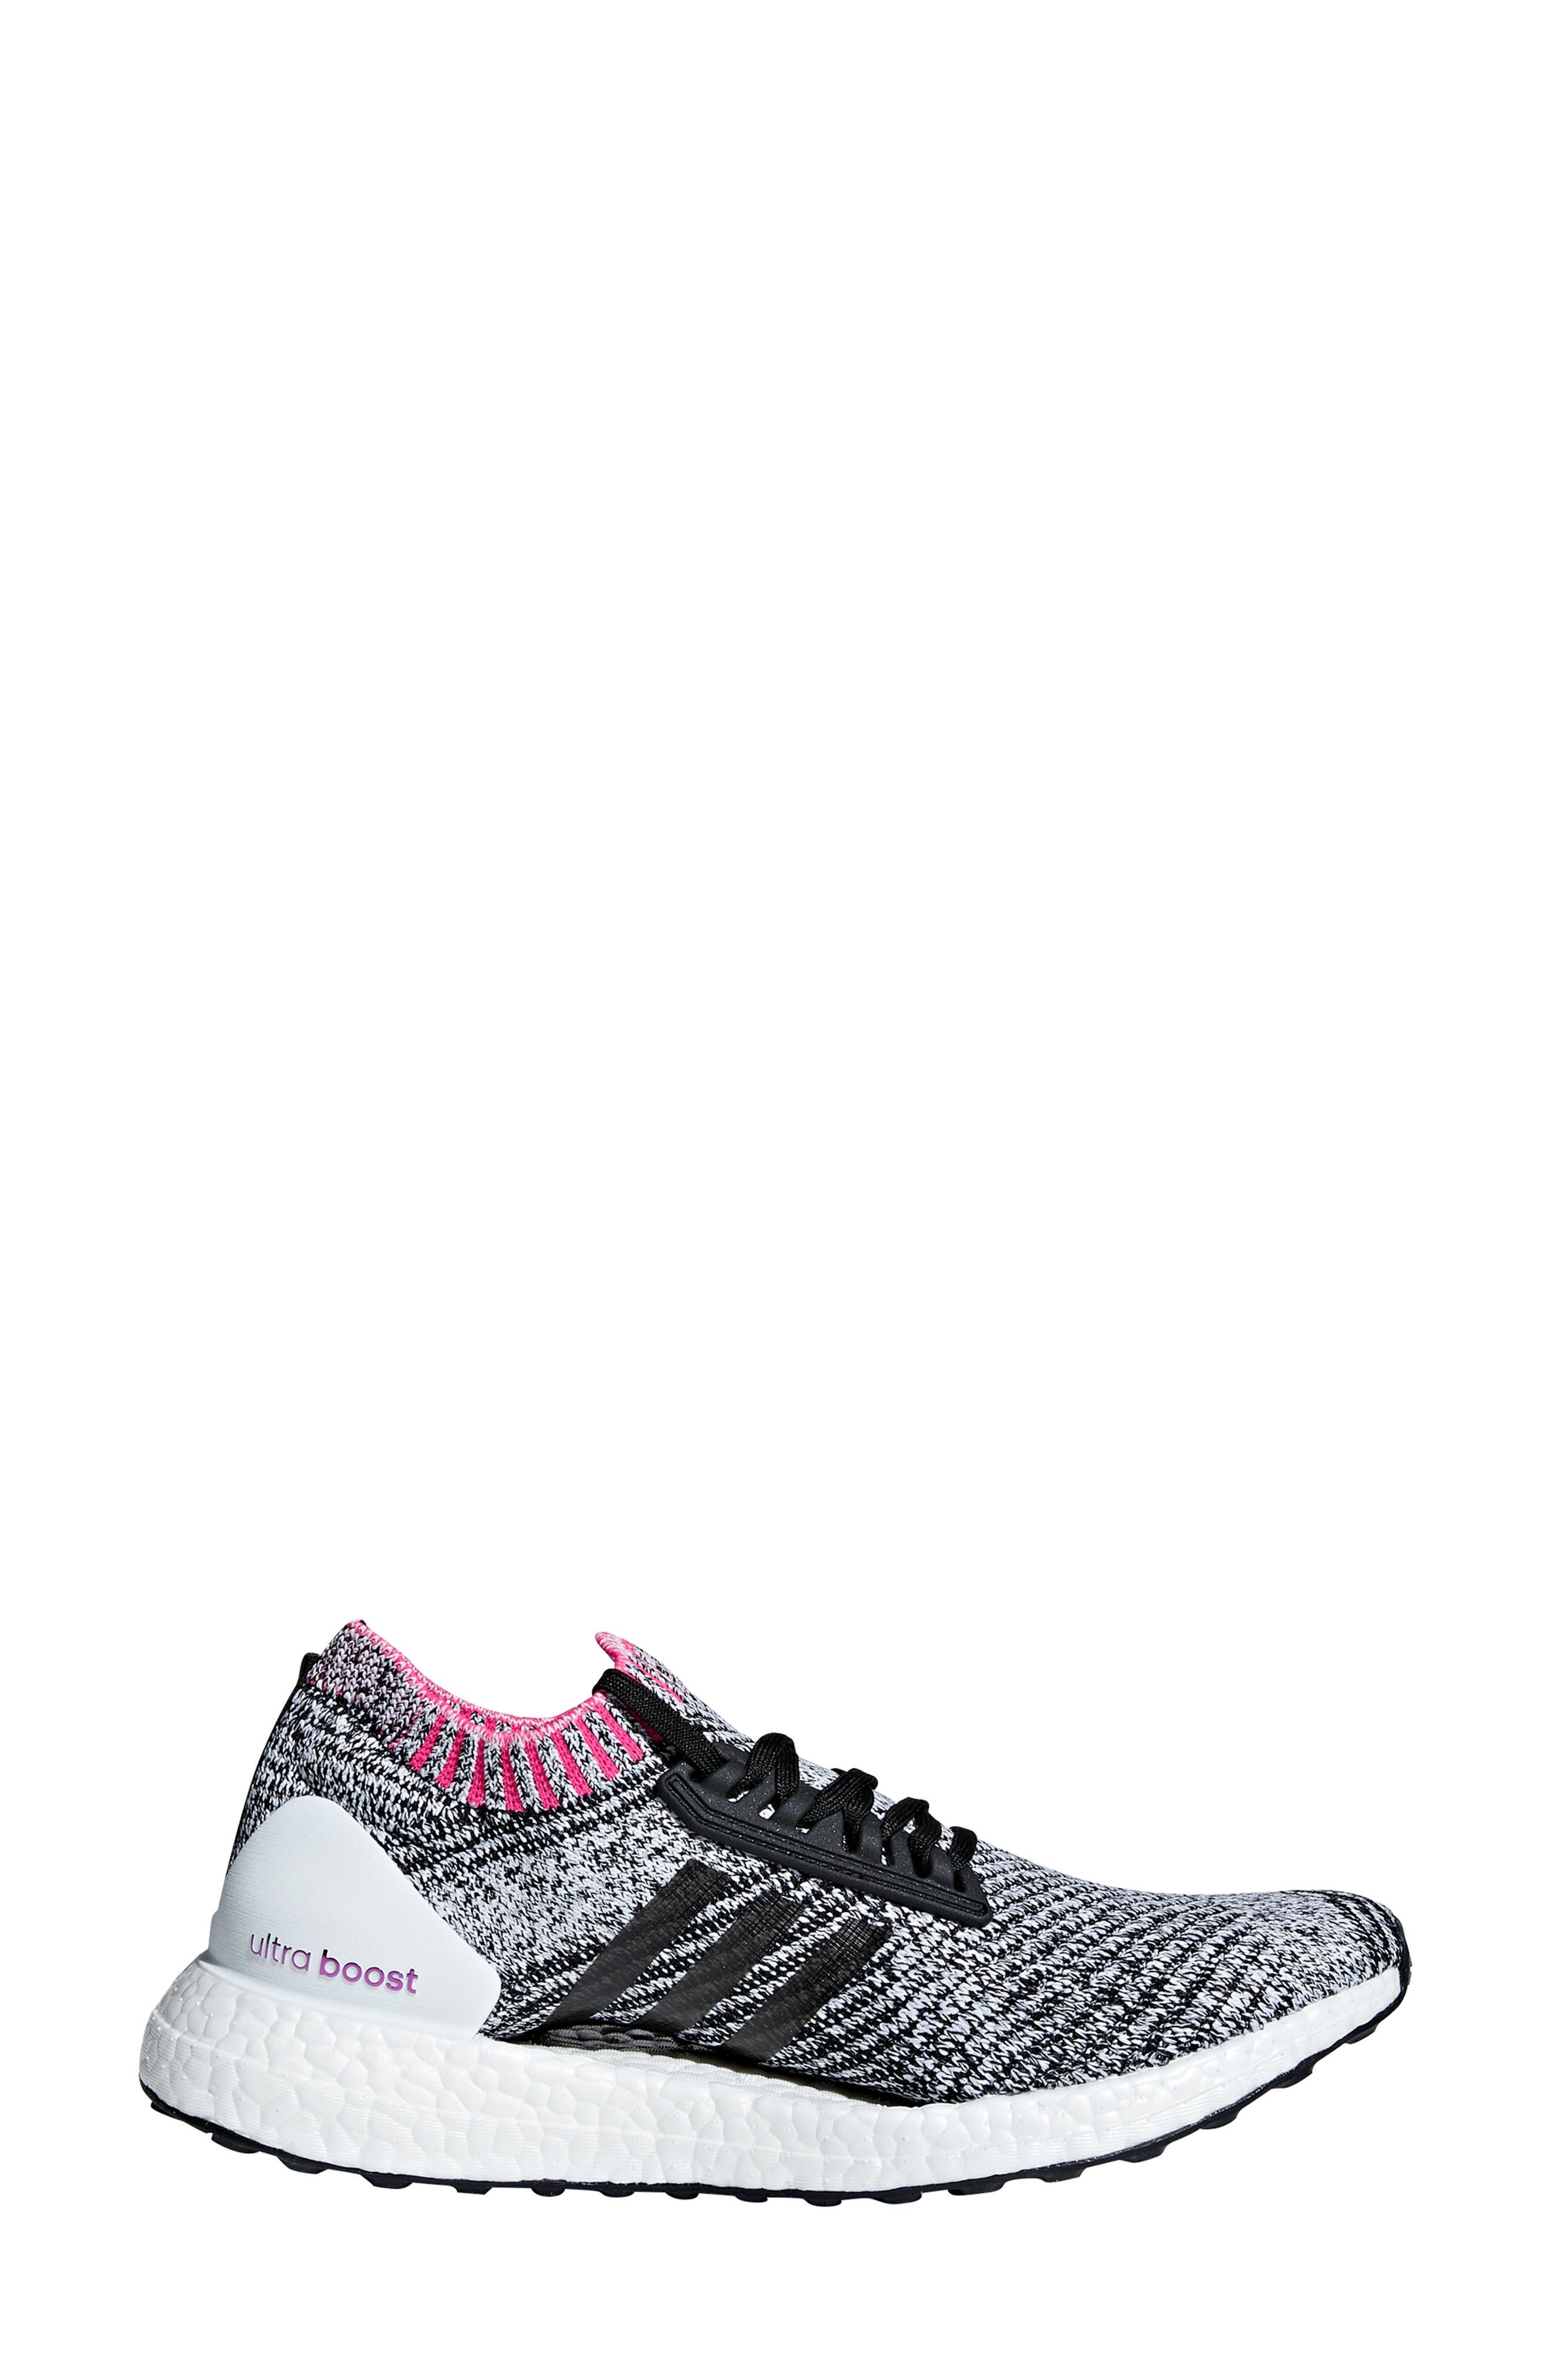 UltraBoost X Running Shoe,                             Alternate thumbnail 3, color,                             WHITE/ BLACK/ SHOCK PINK